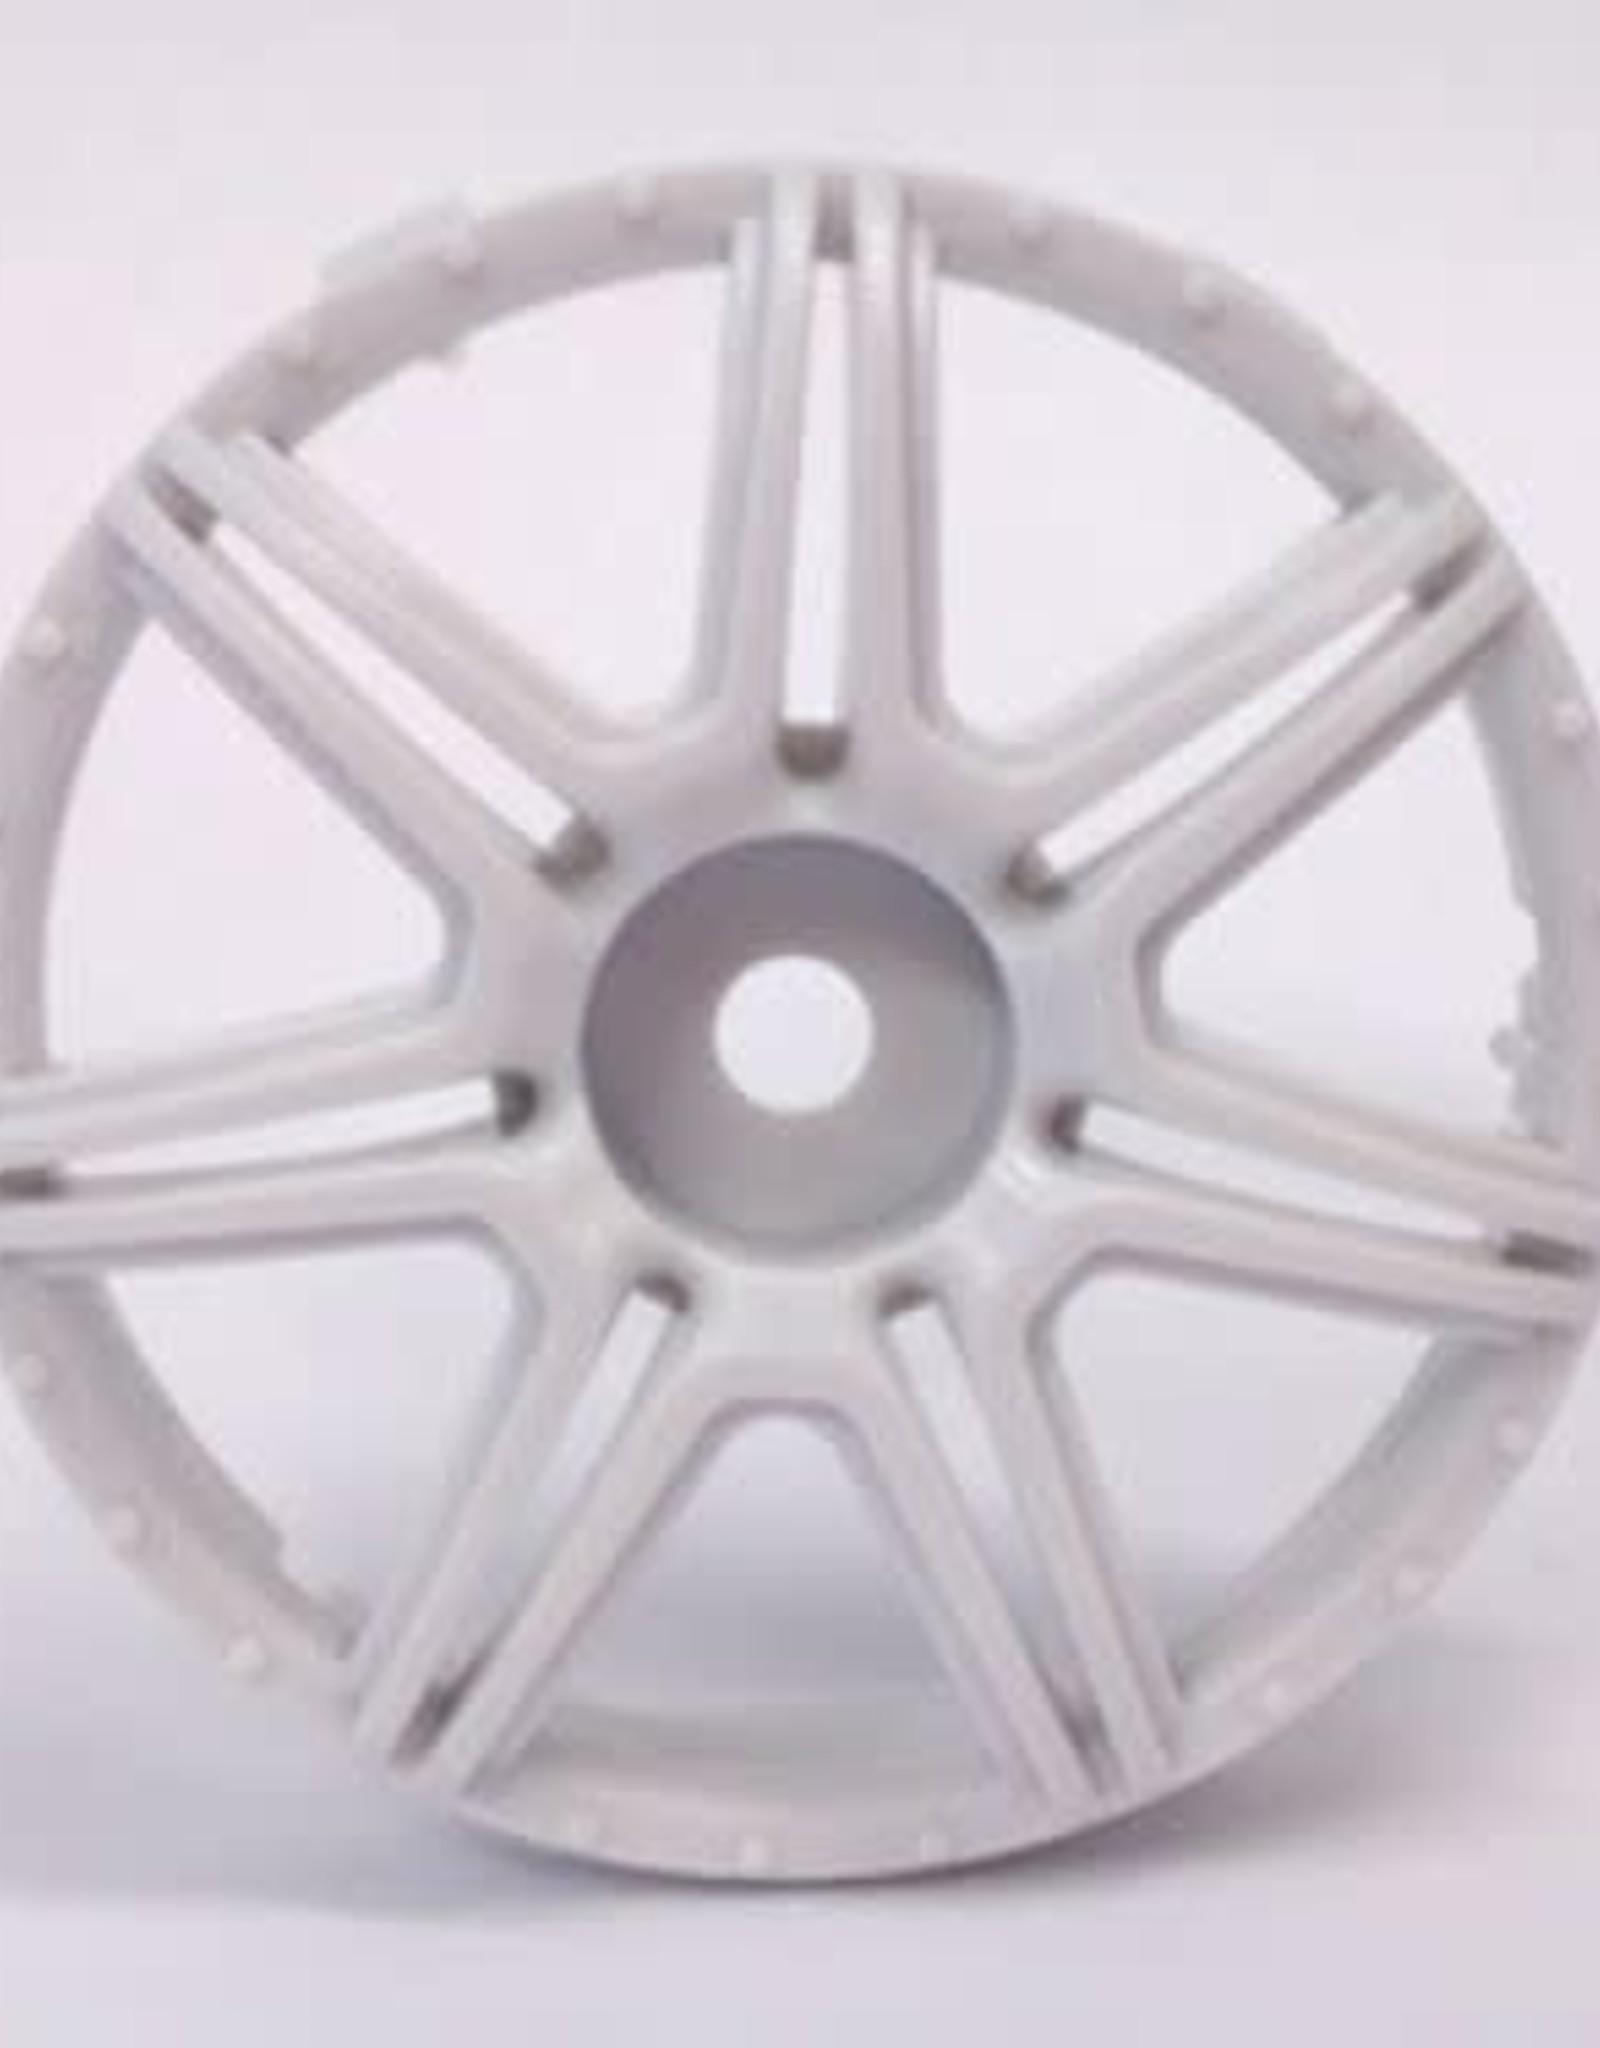 Tetsujin TT-7565 Super Rim Marguerite White Disks 2pcs. by Tetsujin